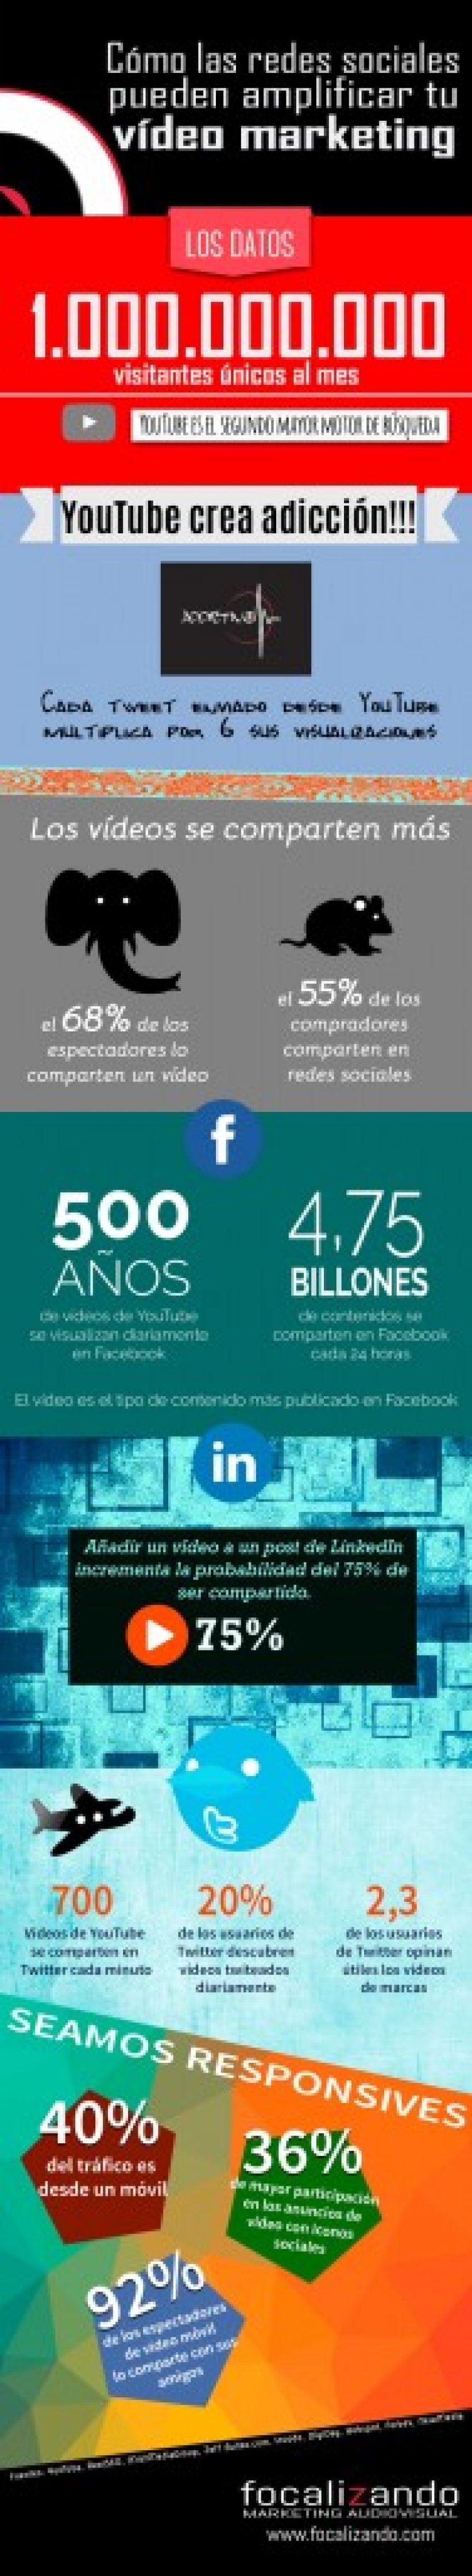 infografia-videomarketing-focalizando